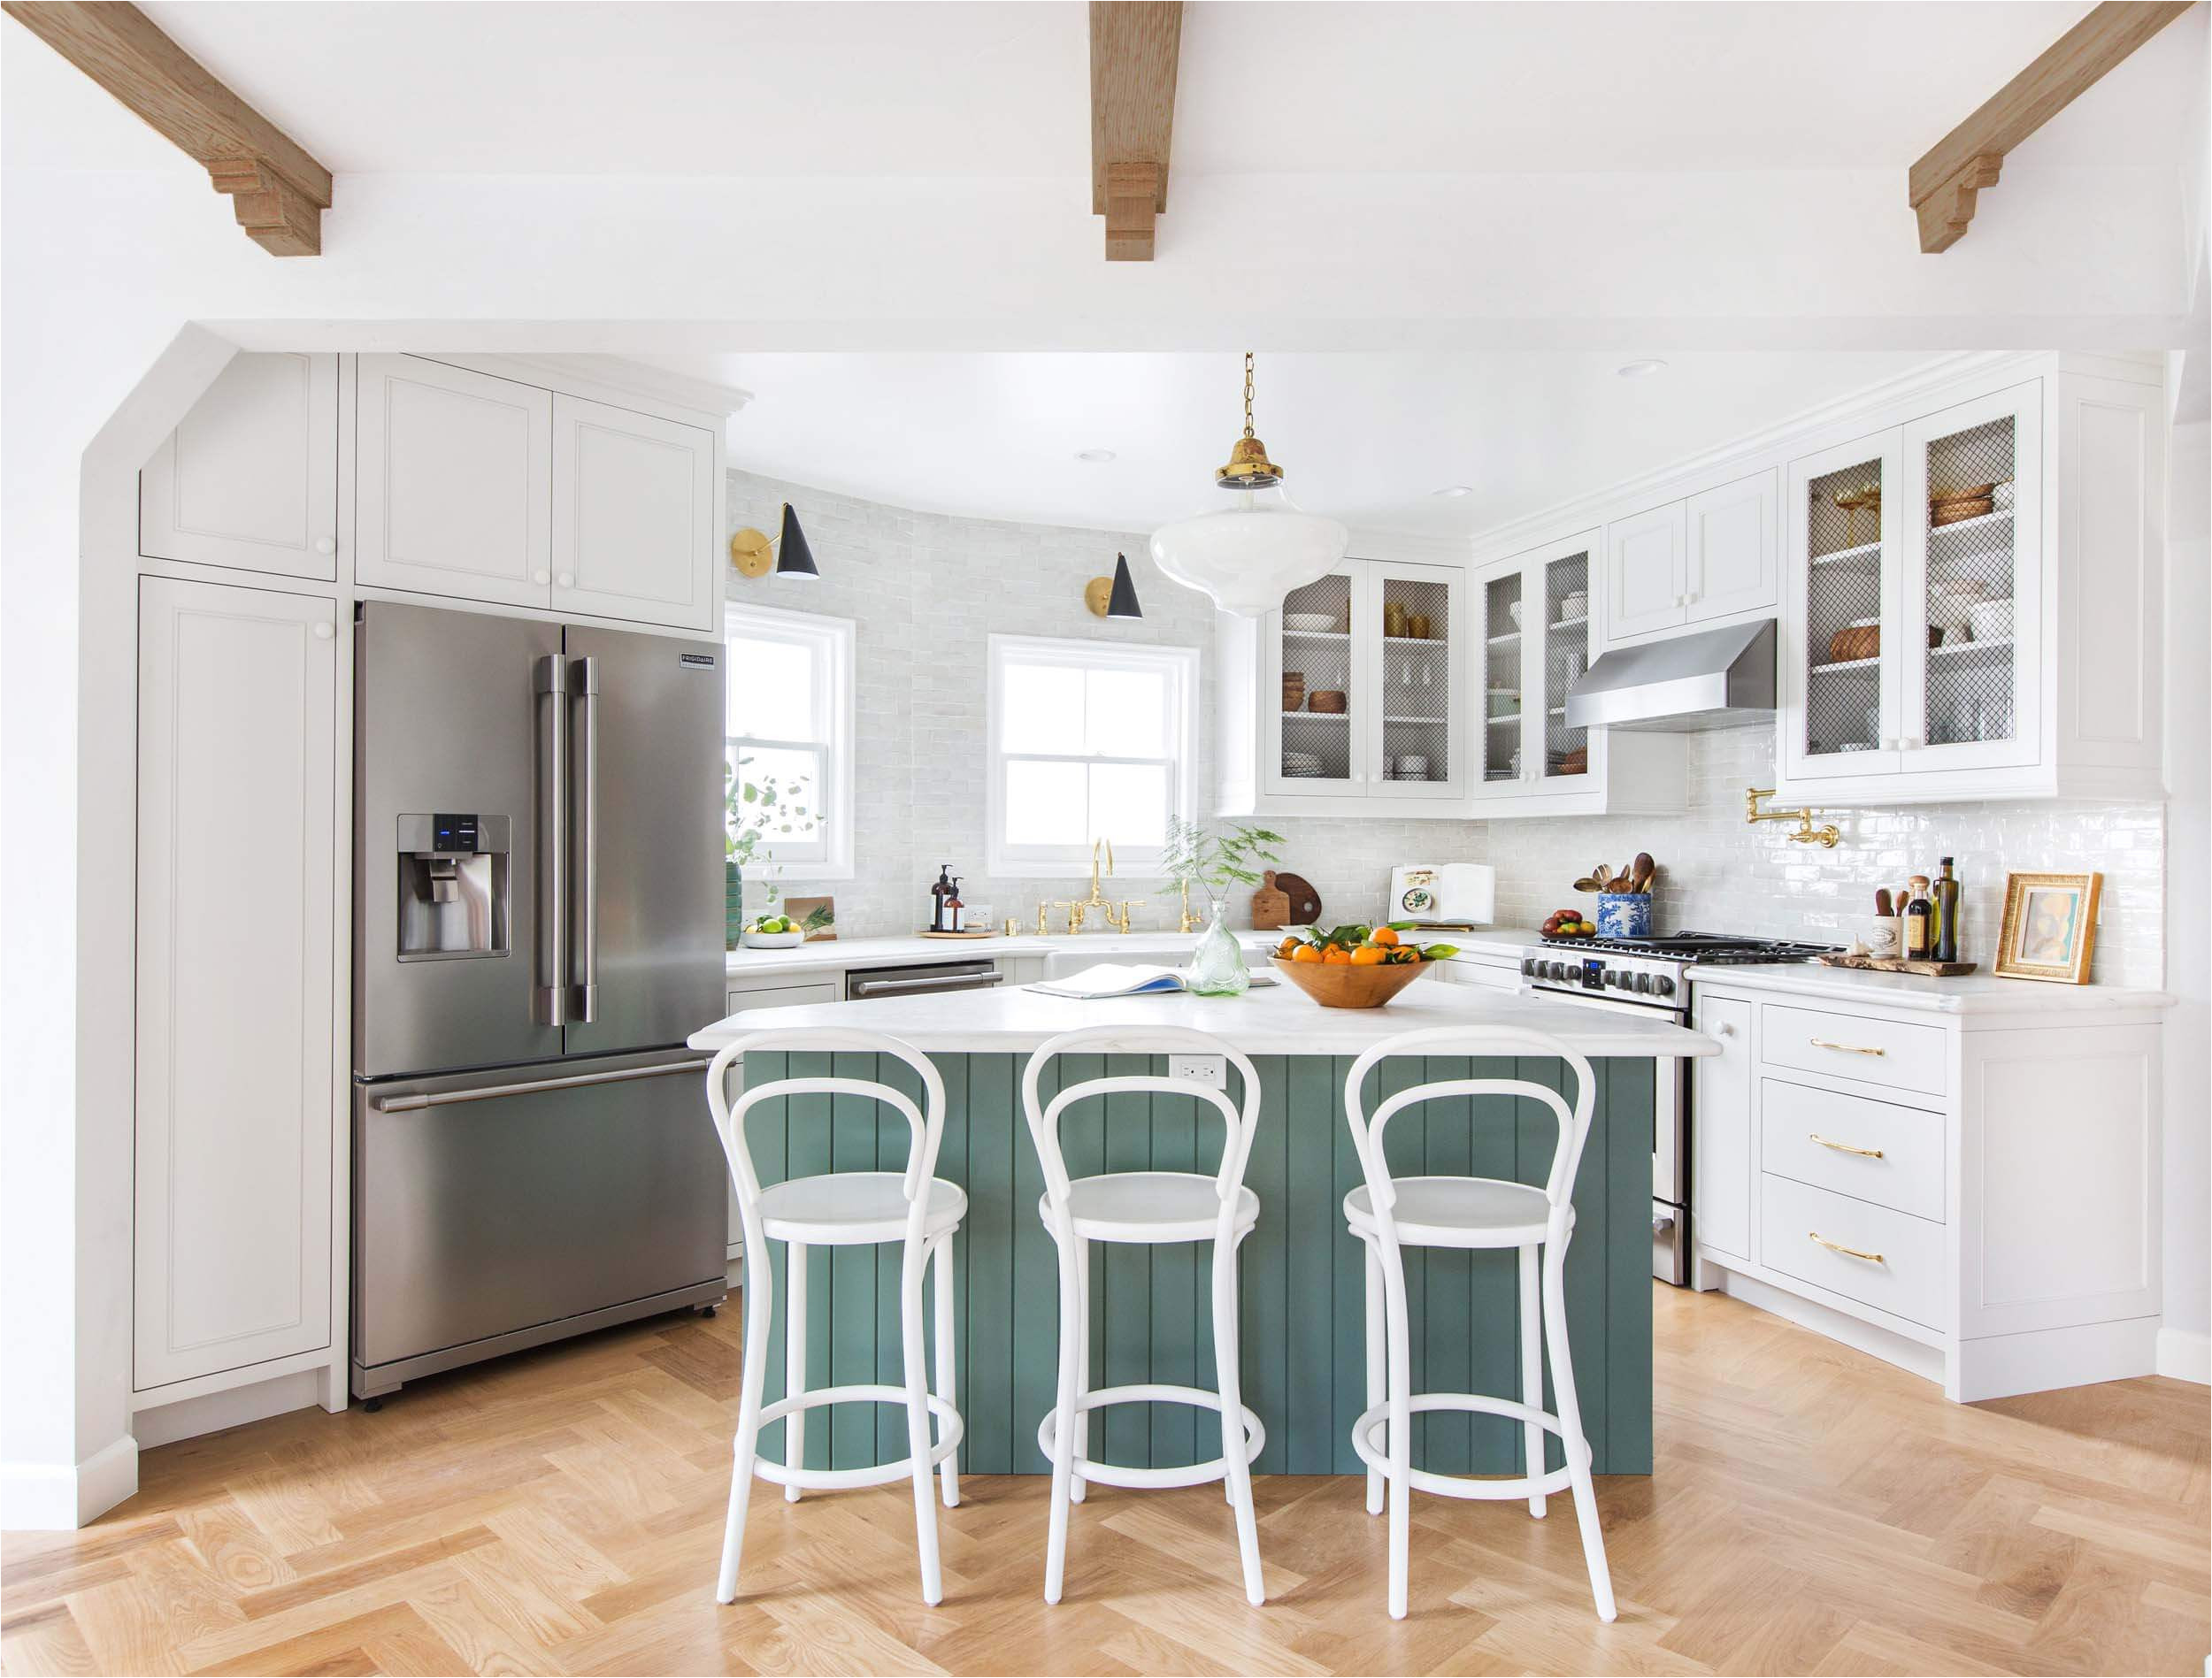 emily henderson frigidaire kitchen reveal waverly english modern edited beams 121